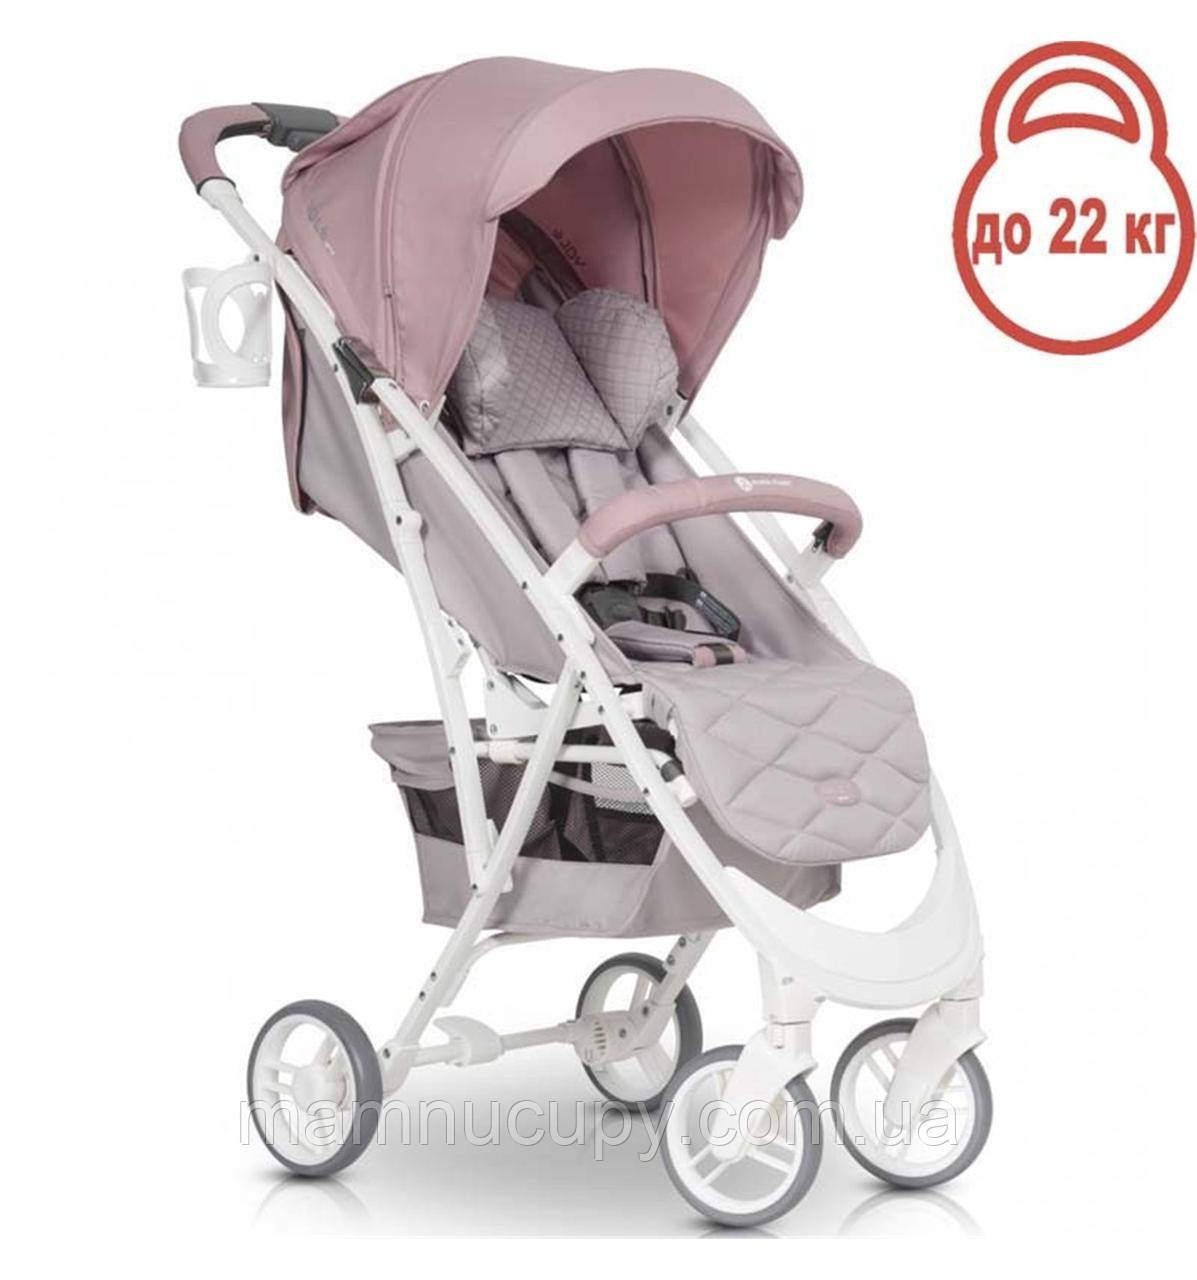 Дитяча прогулянкова коляска Euro-Cart VoltPro Powder Pink